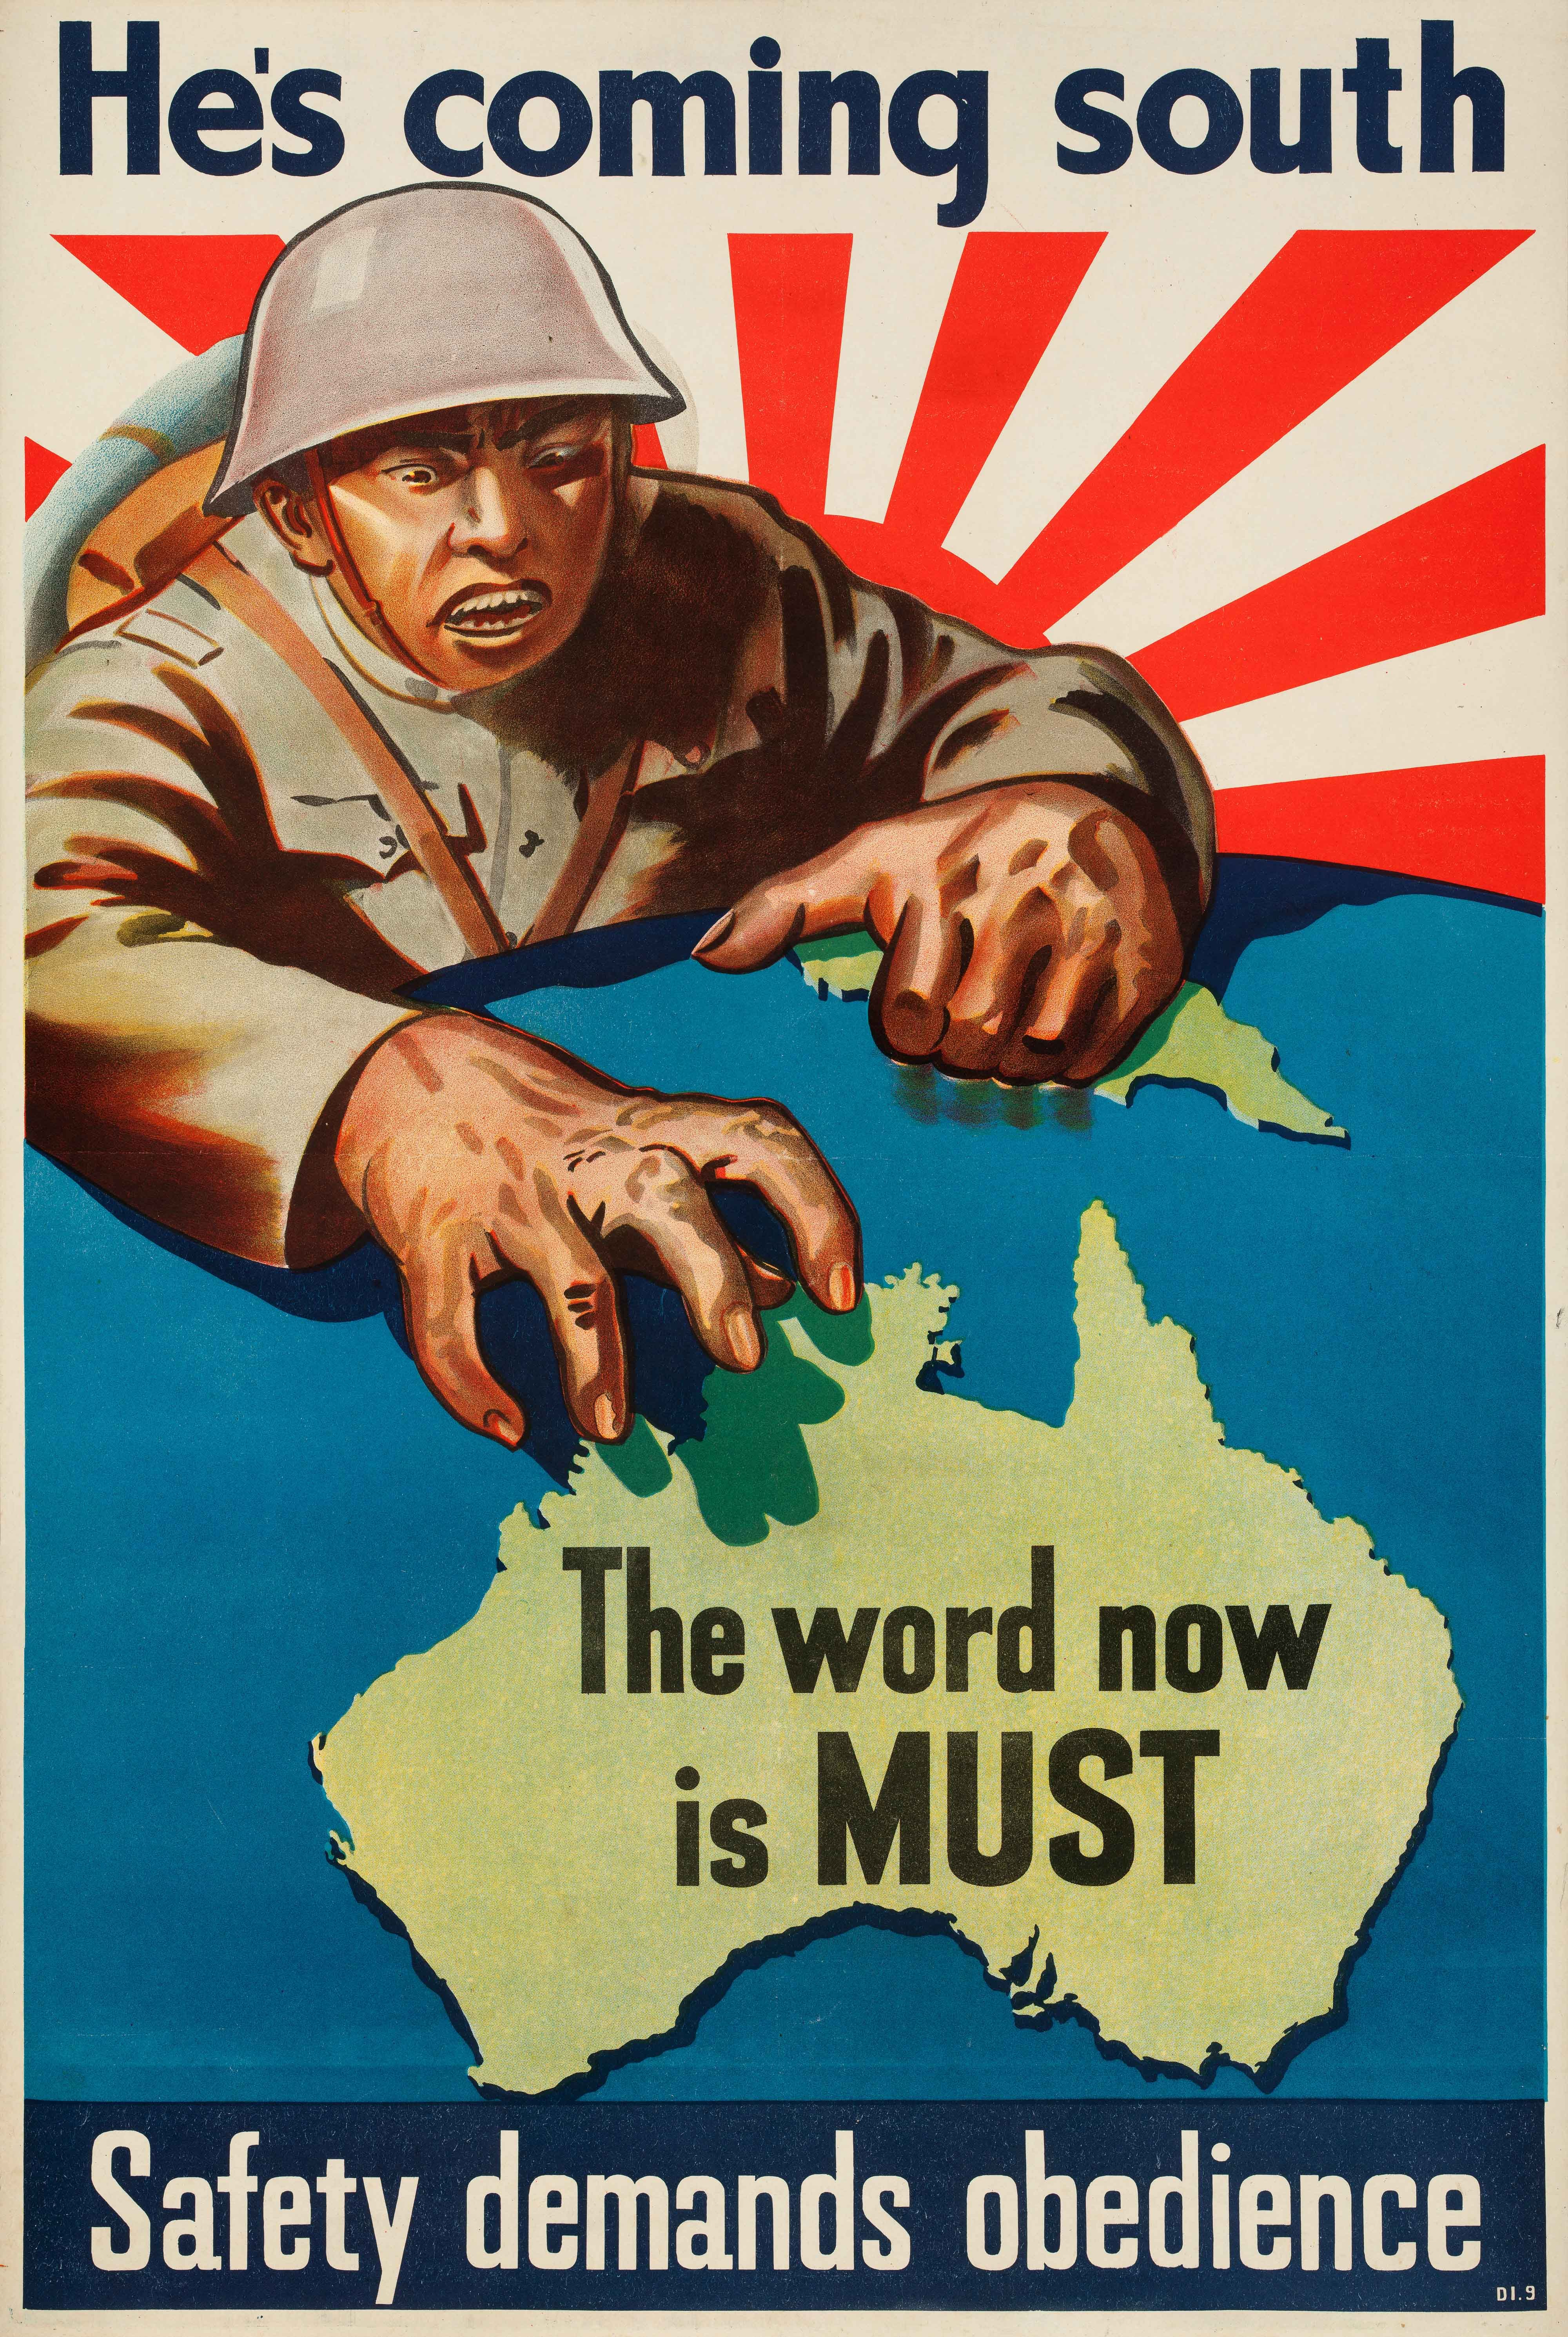 WW2, poster, He's coming south, 1942, Japan, Australia, propaganda